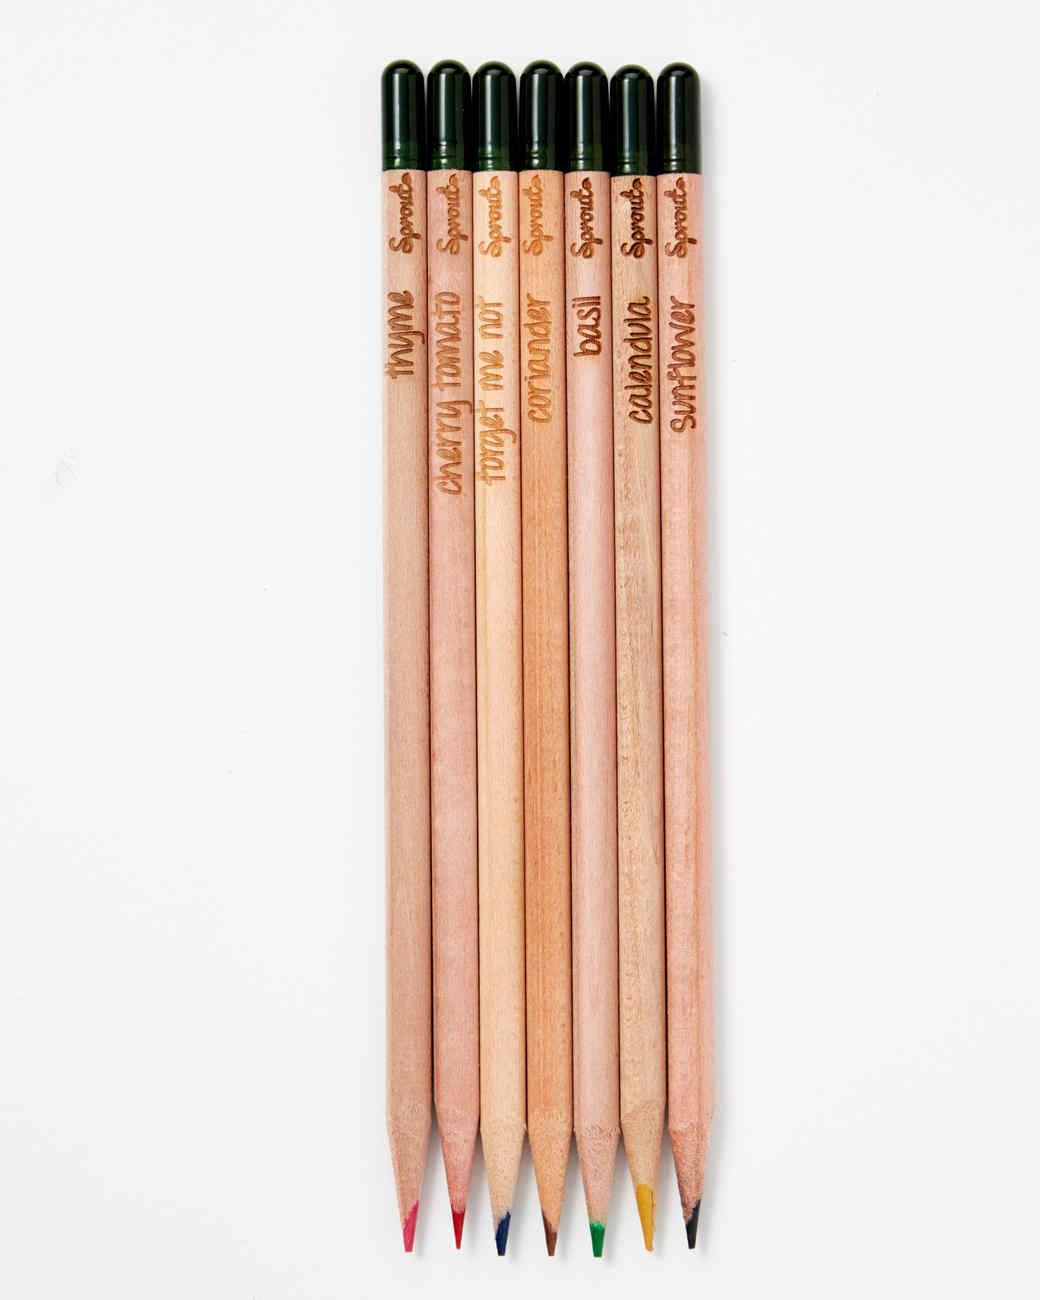 garden-basket-plantable-pencils-3693-d112789-0116.jpg